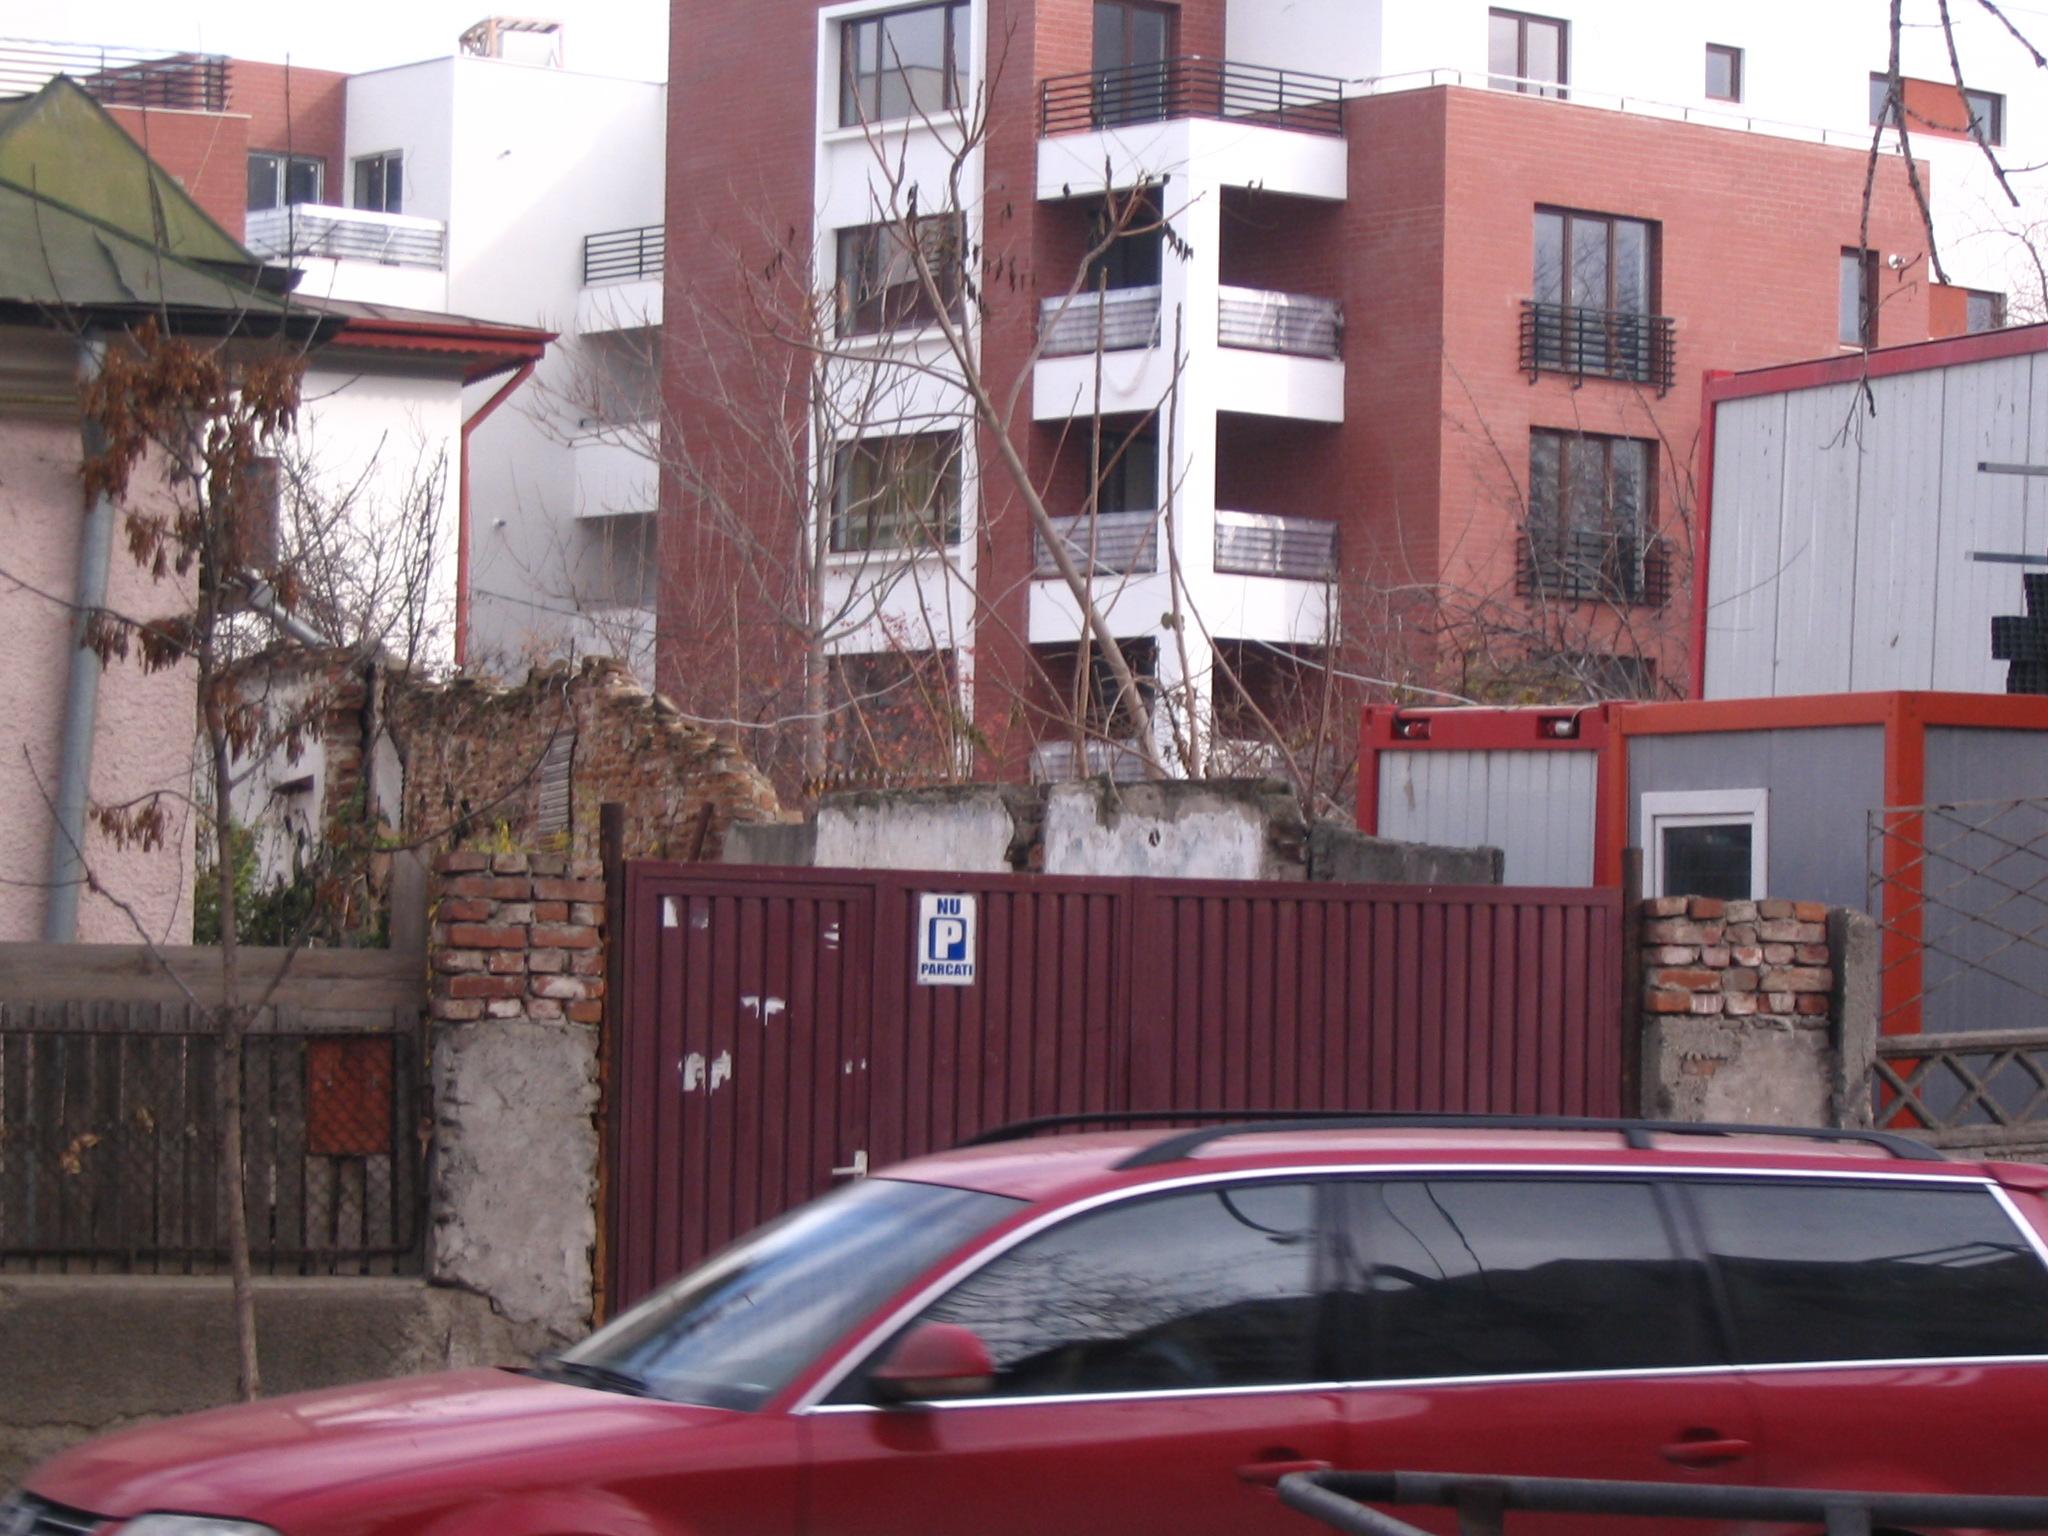 Ansamblu de locuinte in str. Popa Tatu, nr. 60-62, colaborare cu arh. Mihaela Hariton la fazele PAC si DDE  - Poza 12